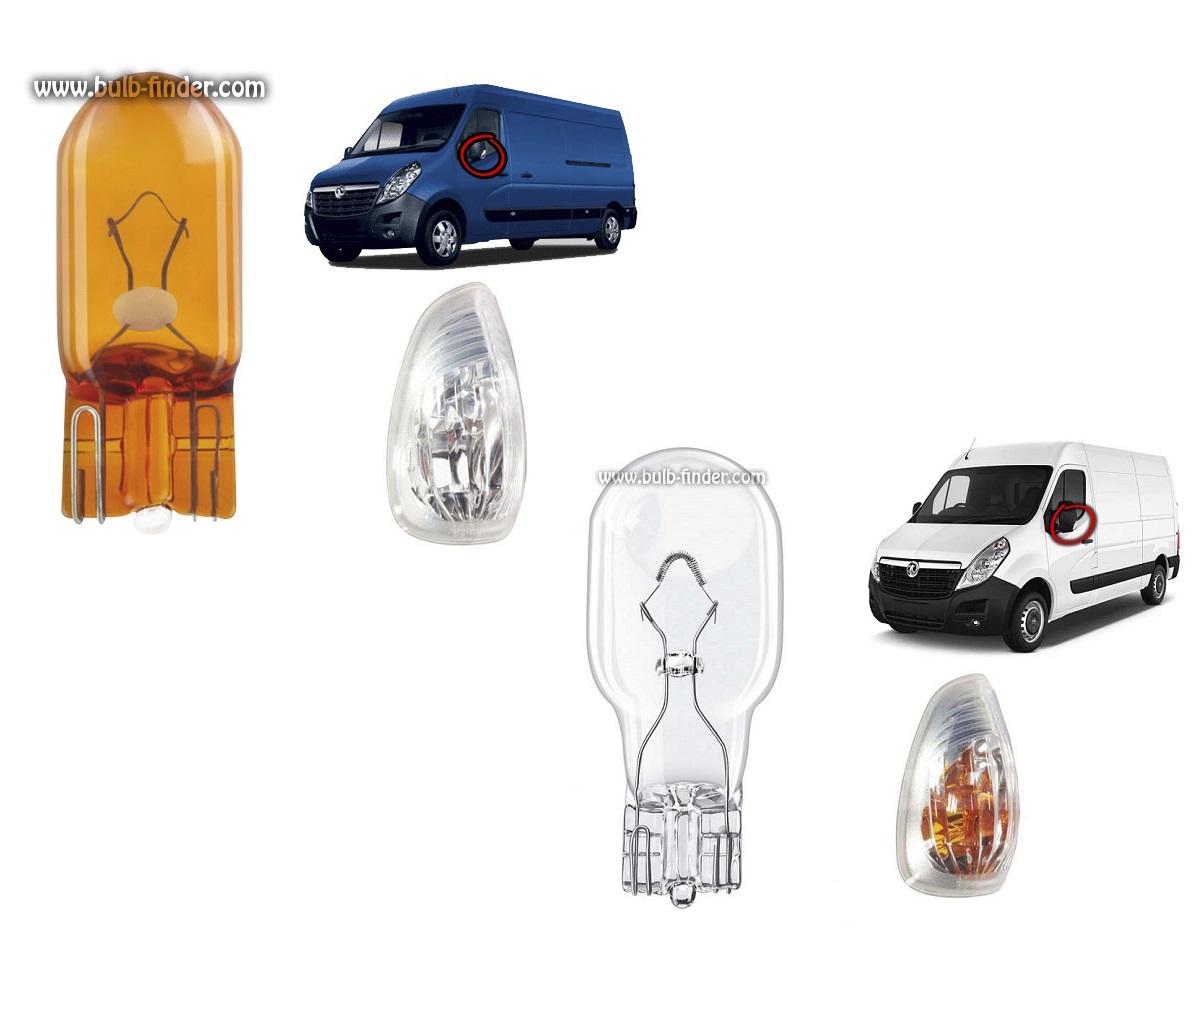 Vauxhall Movano II bulbs specification for halogen headlamp